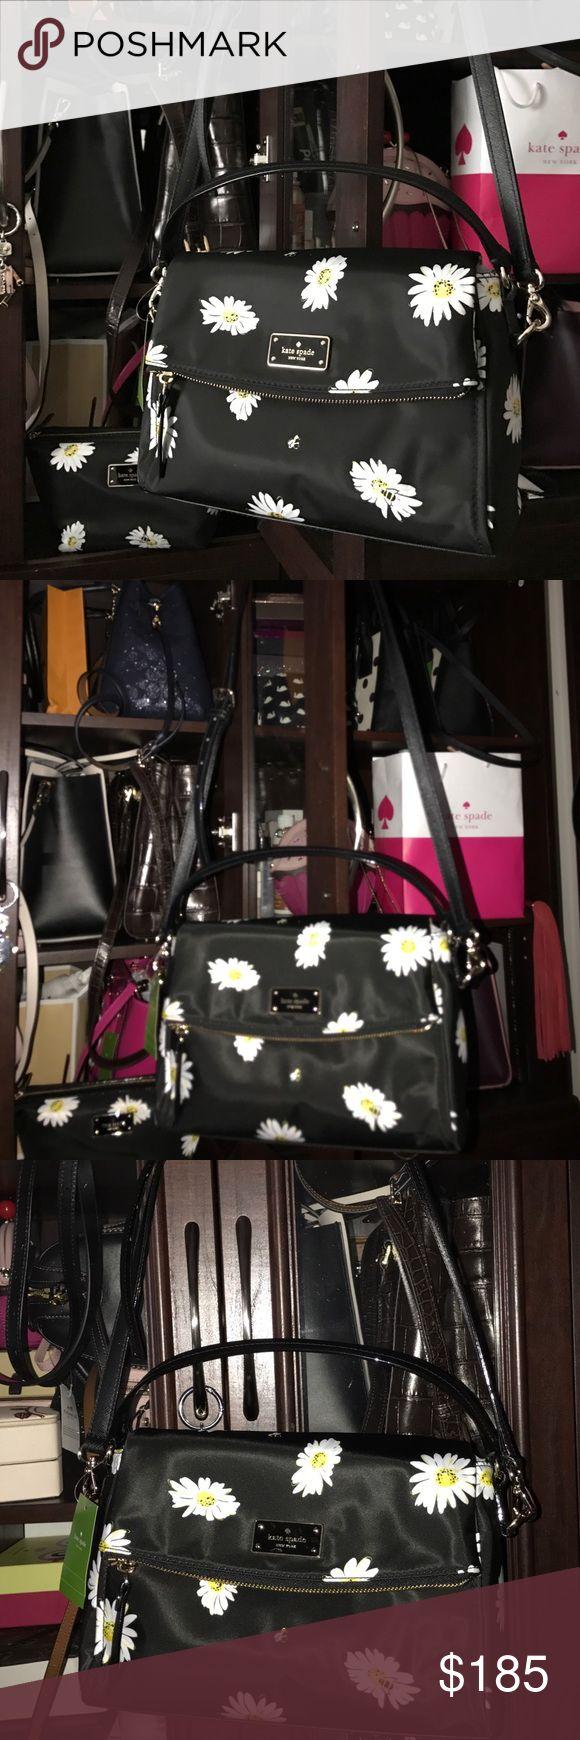 Kate Spade Miri Daisy Purse $215 Kate Spade Miri Daisy Purse kate spade Bags Shoulder Bags